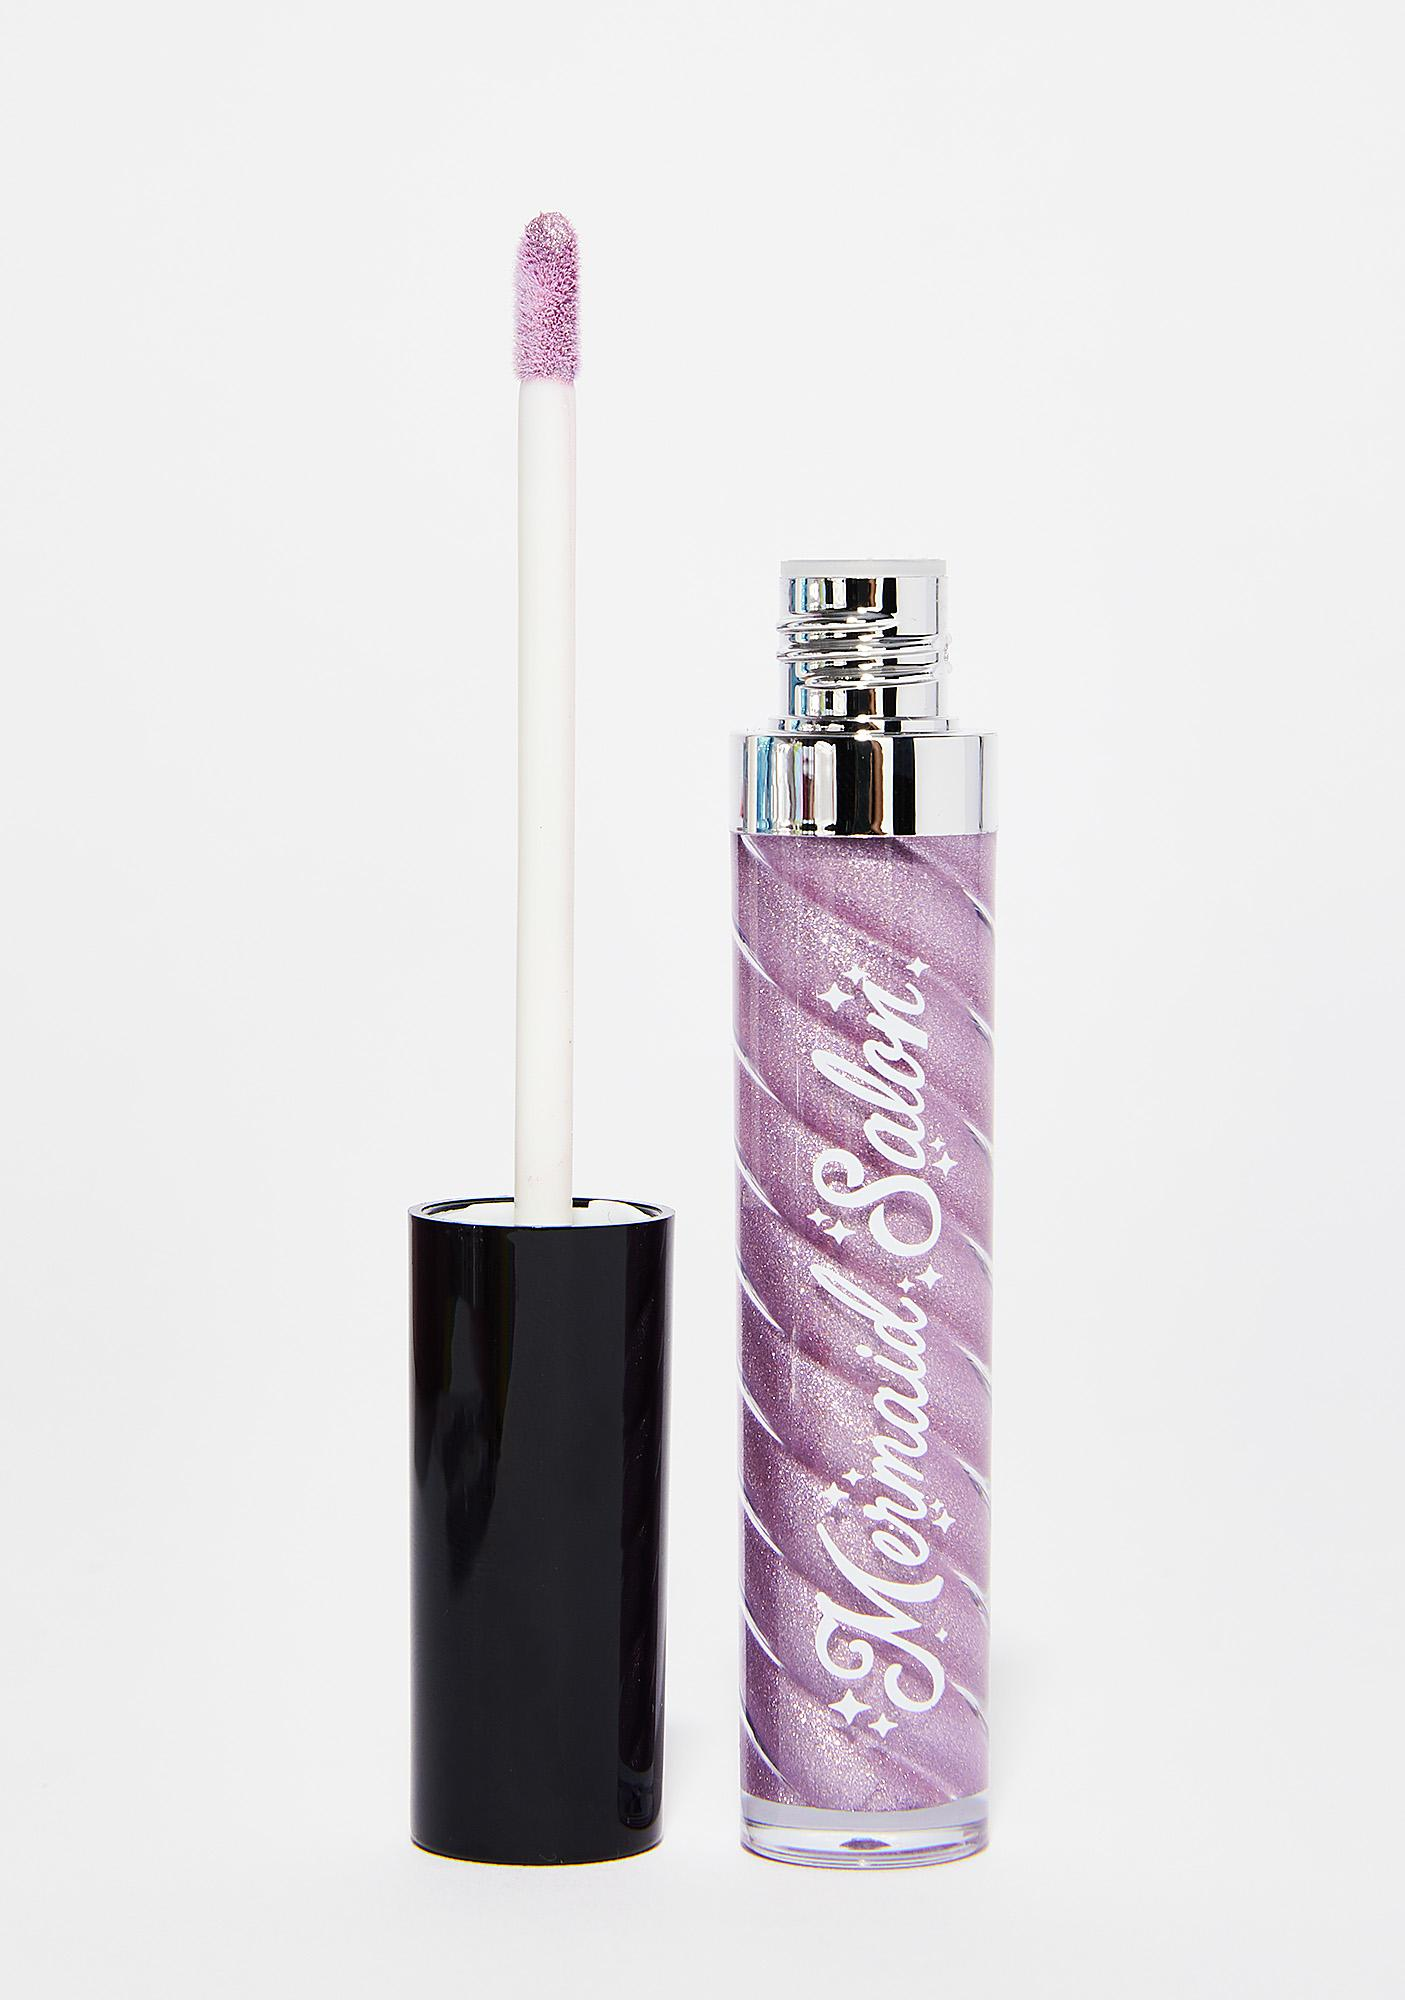 Mermaid Salon Lavender Matter Luxe Liquid Lipstick